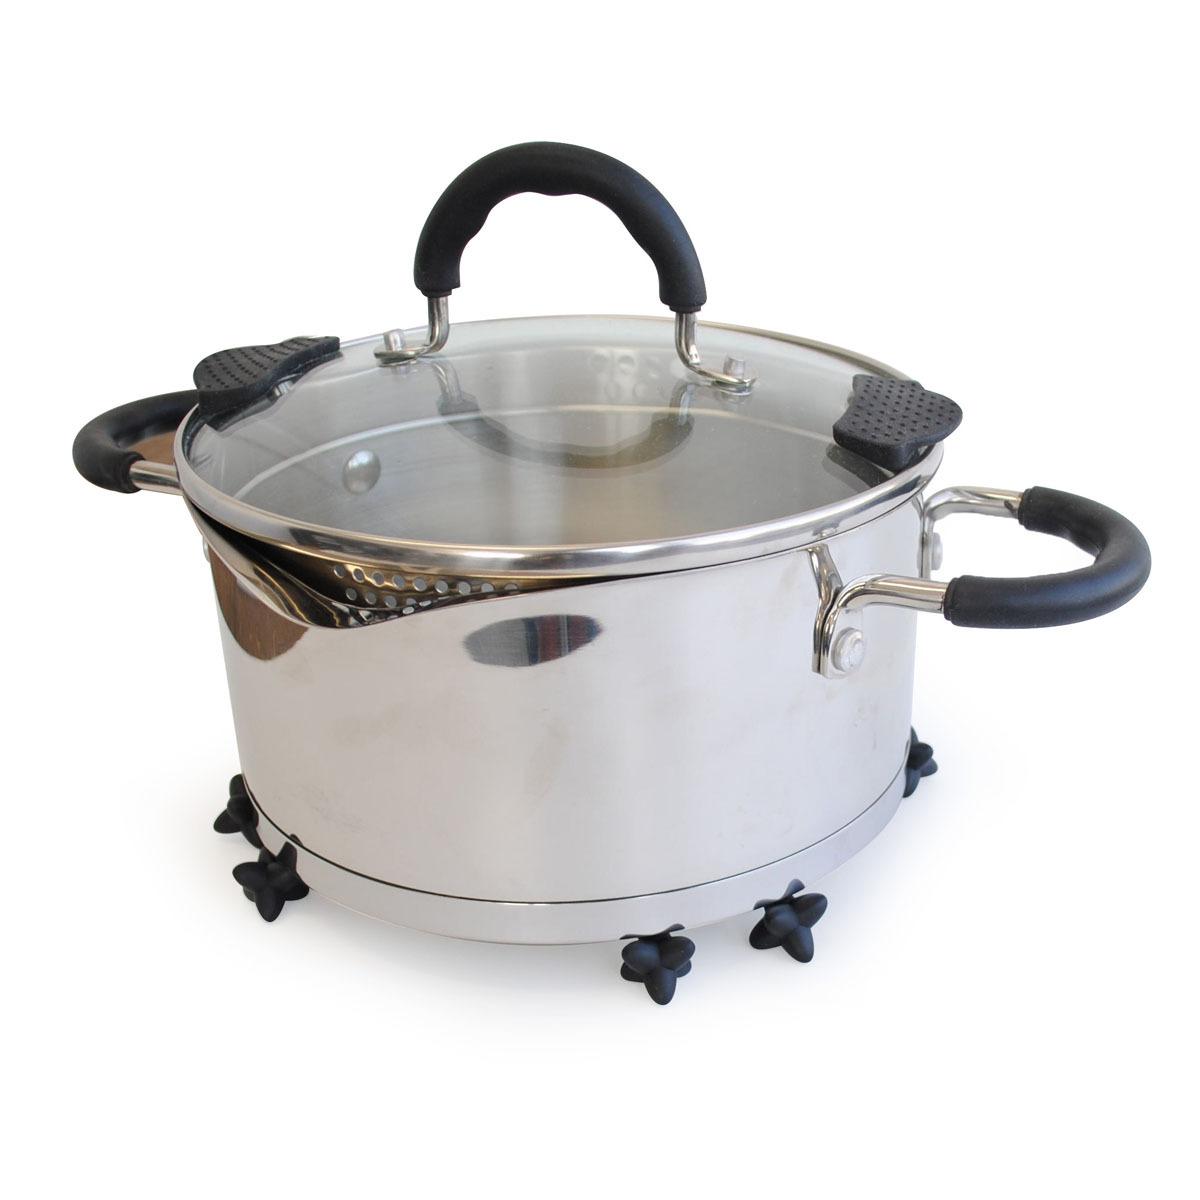 TOVOLO タンブルトリベット 収納スペースを考えたら、ミニマルな鍋敷きになりました。